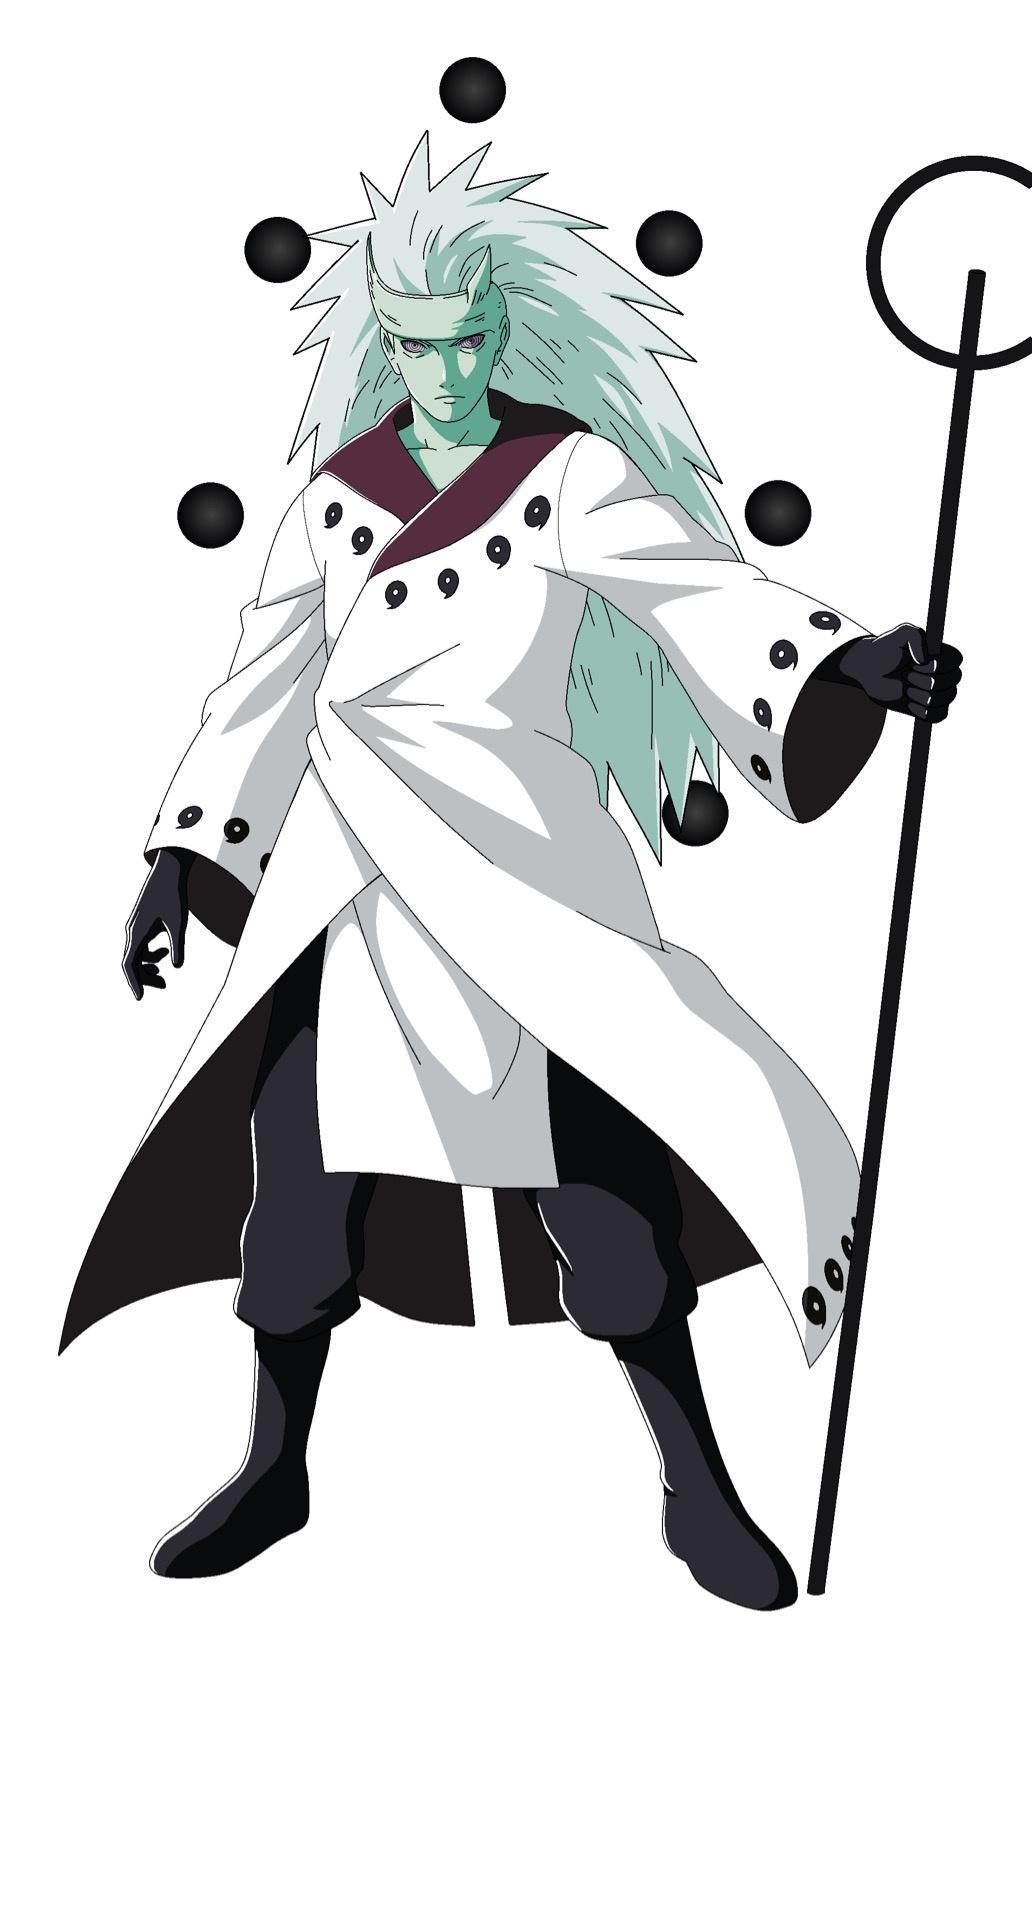 Can Naruto God Tiers destroy a planet, like Kaguya, Madara